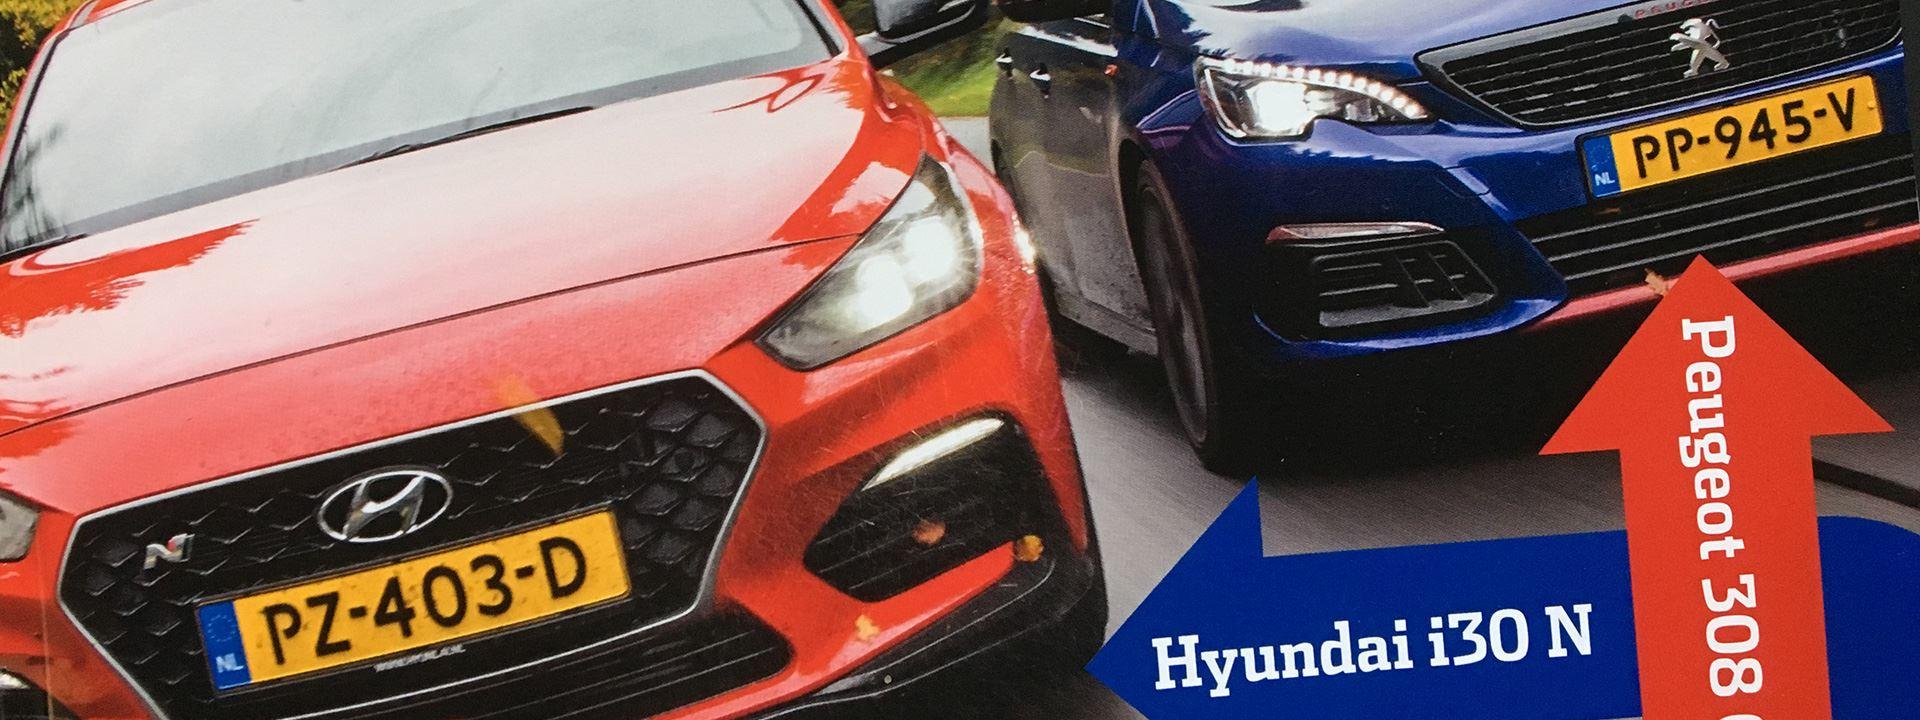 Autovisie: Rookie Hyundai i30 N verslaat ervaren Peugeot 308 GTI